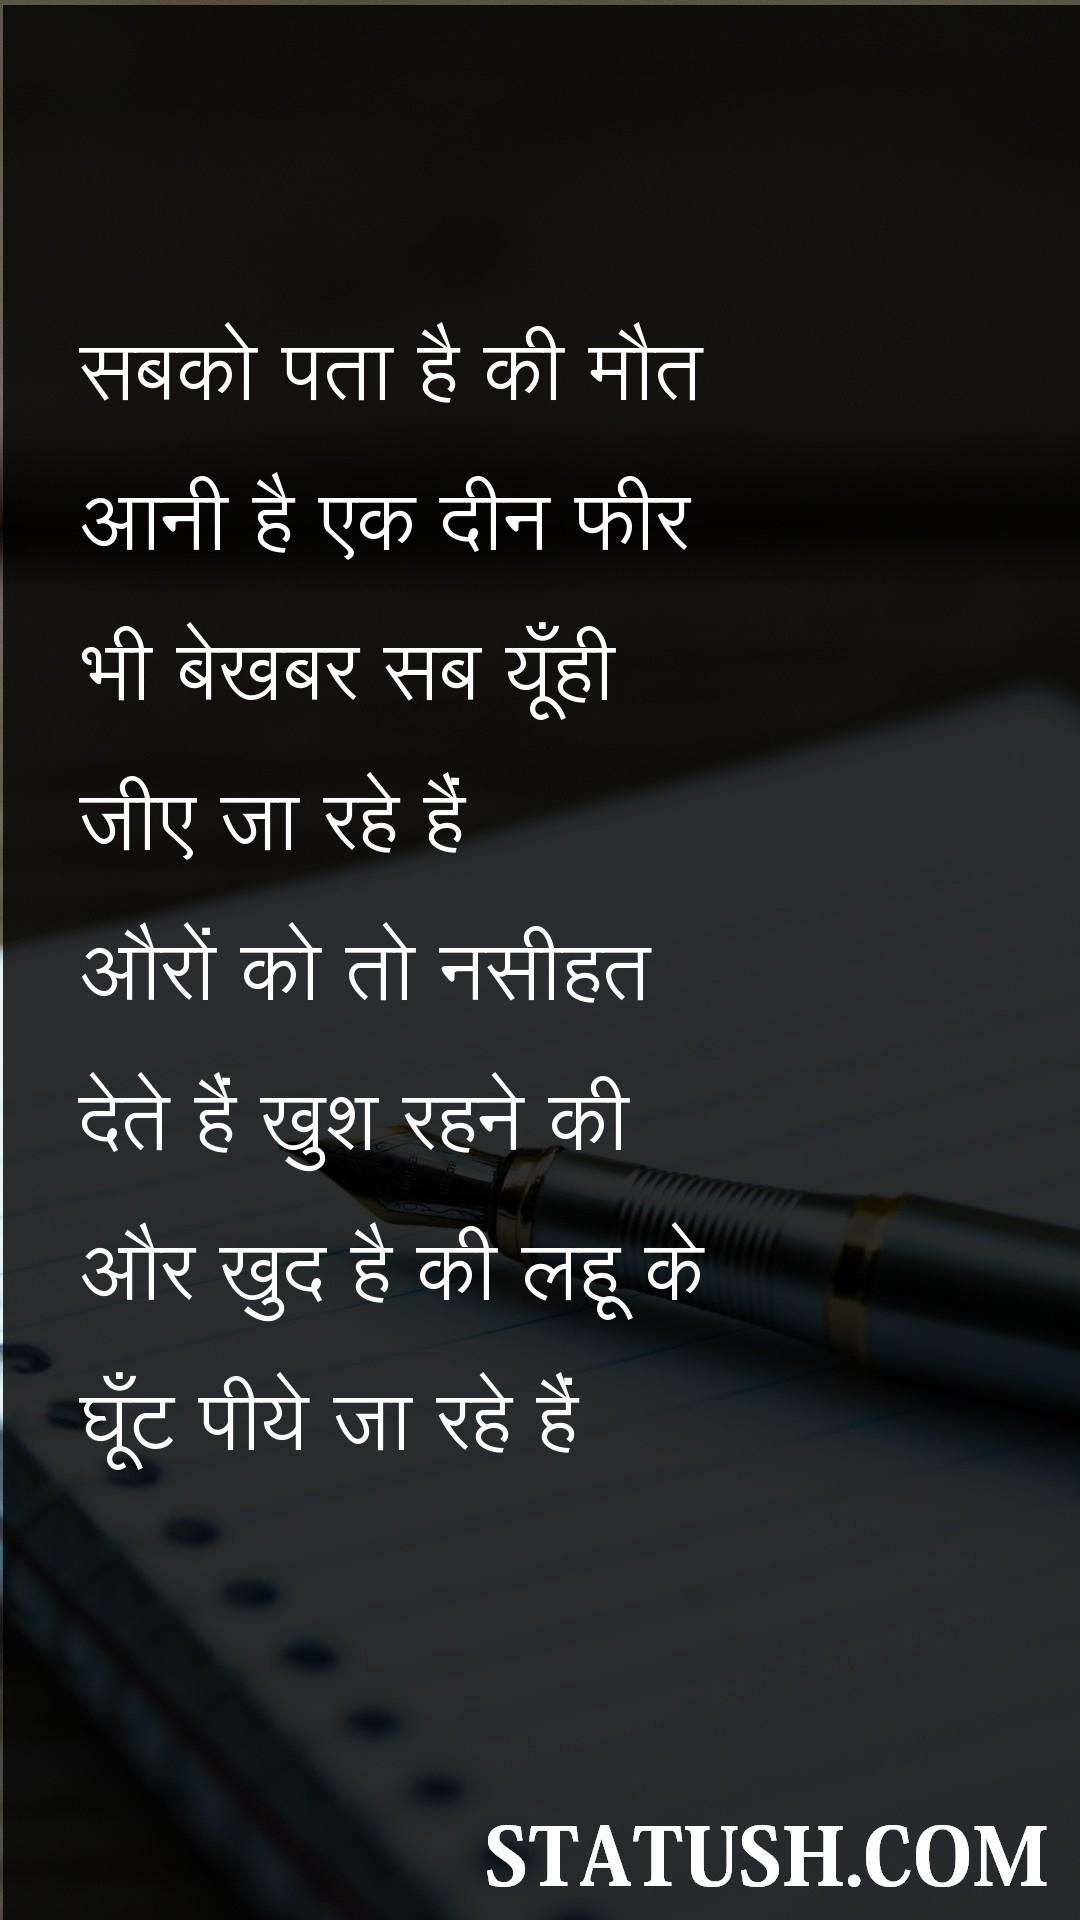 Hindi Shayri on Nasihat